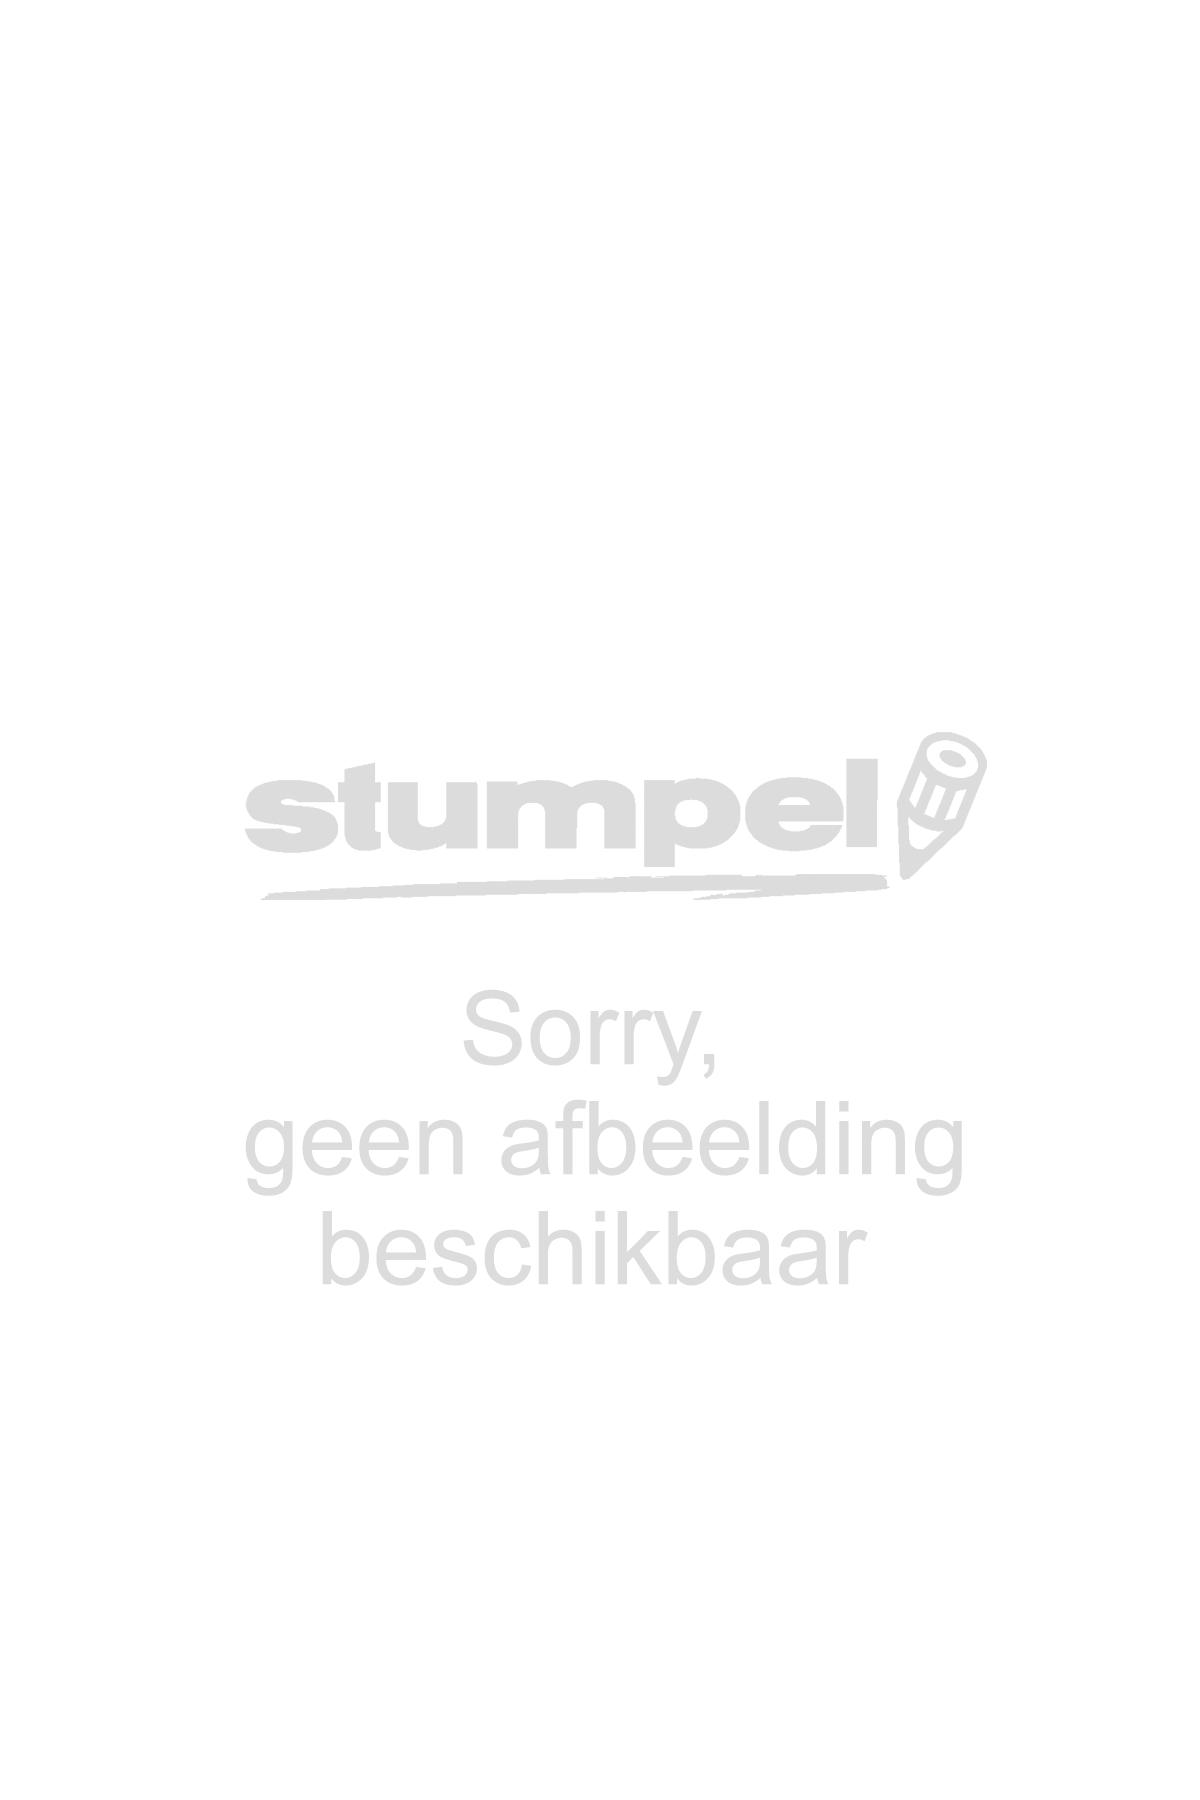 Toetsenbord, Logitech DT-MK520 + muis, draadloos